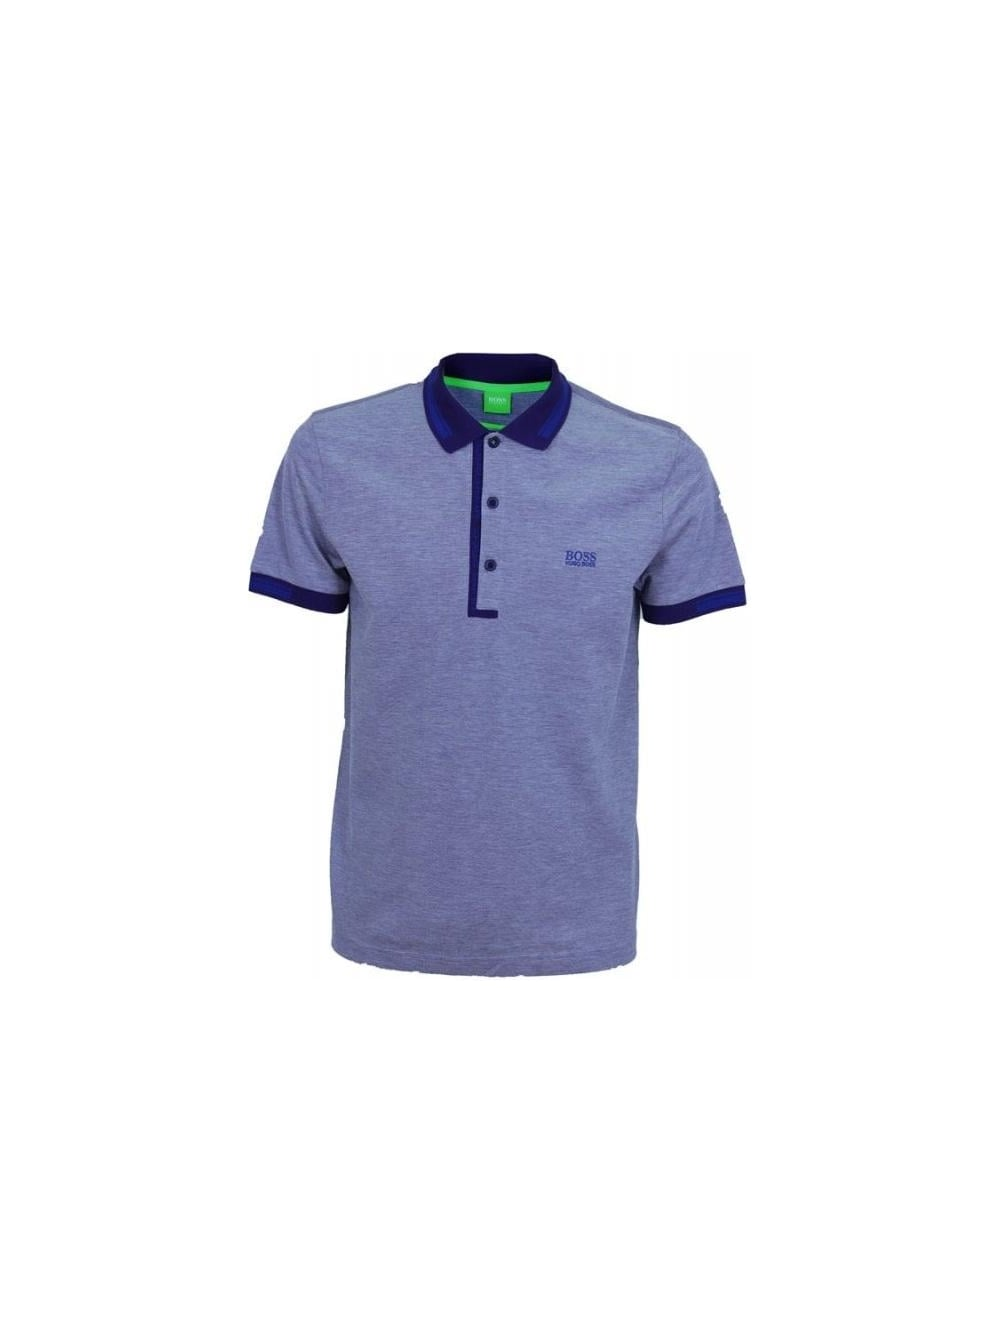 025891c4c Hugo Boss Green Paule 4 Polo in Dark Purple - Northern Threads